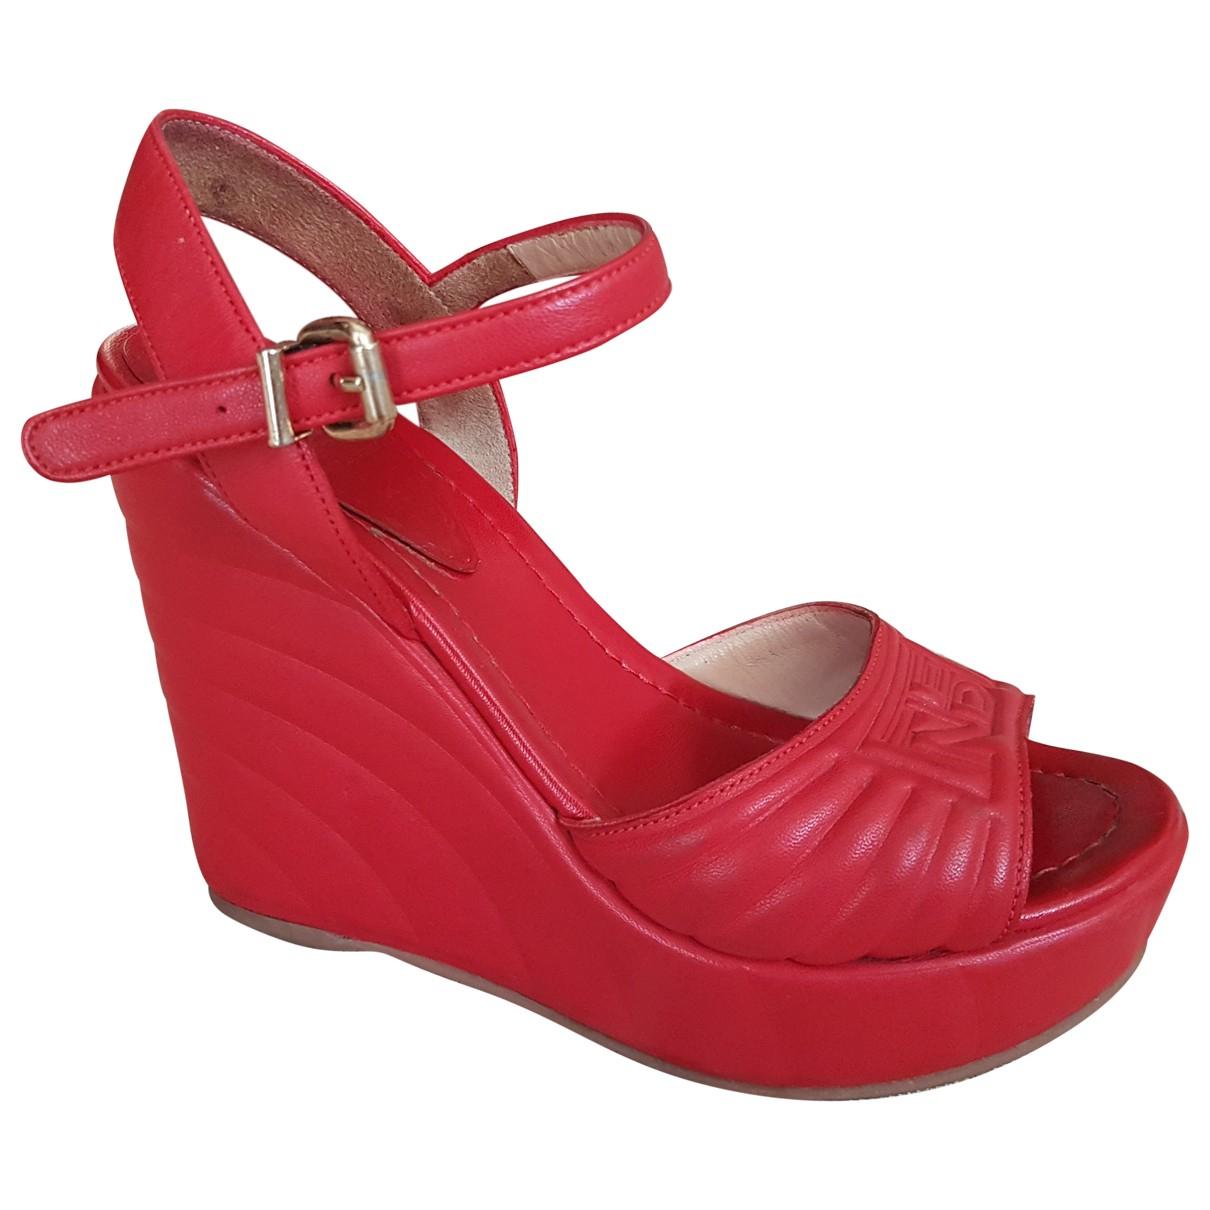 Fendi \N Red Leather Sandals for Women 36 EU